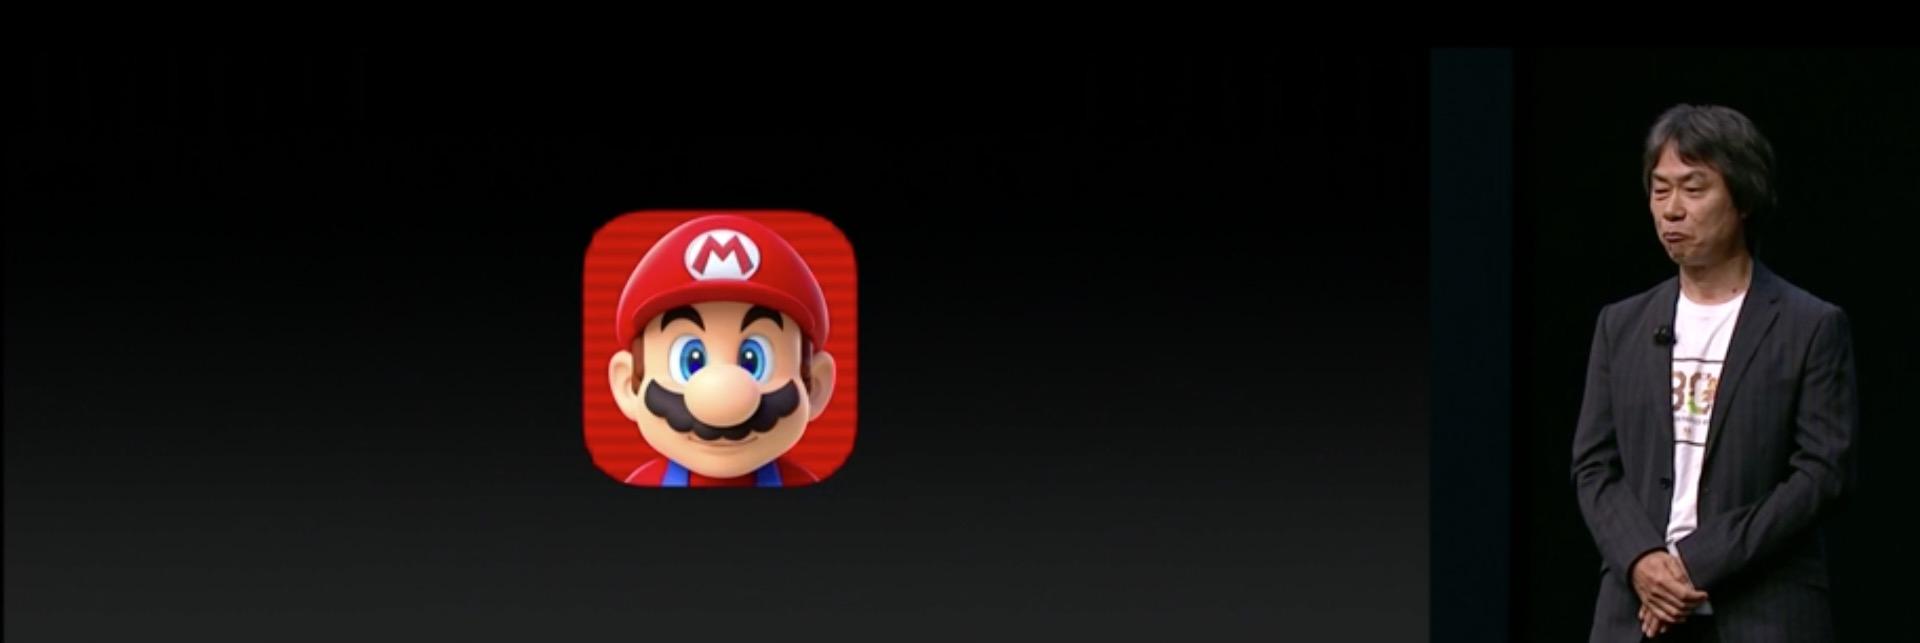 appstore_mario_stickers